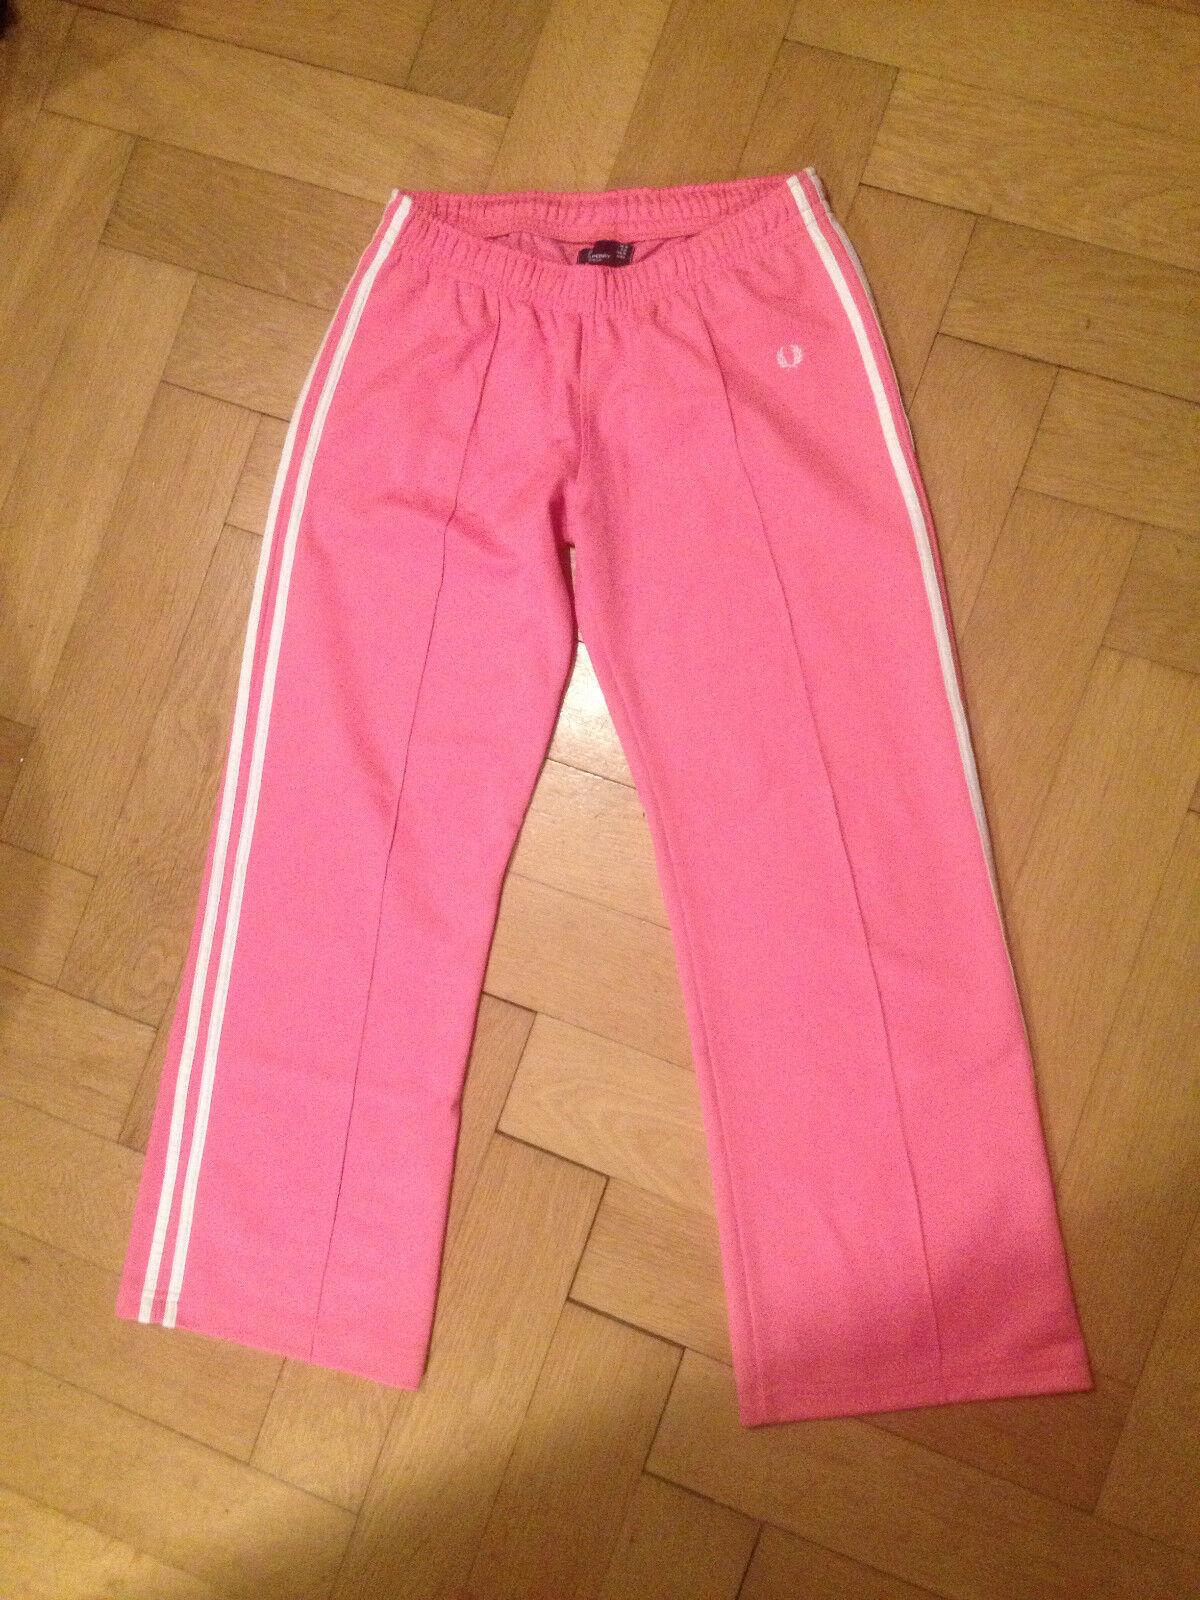 FRED PERRY Jogginghose M swearpants PINK pink Vintage Hipster 38